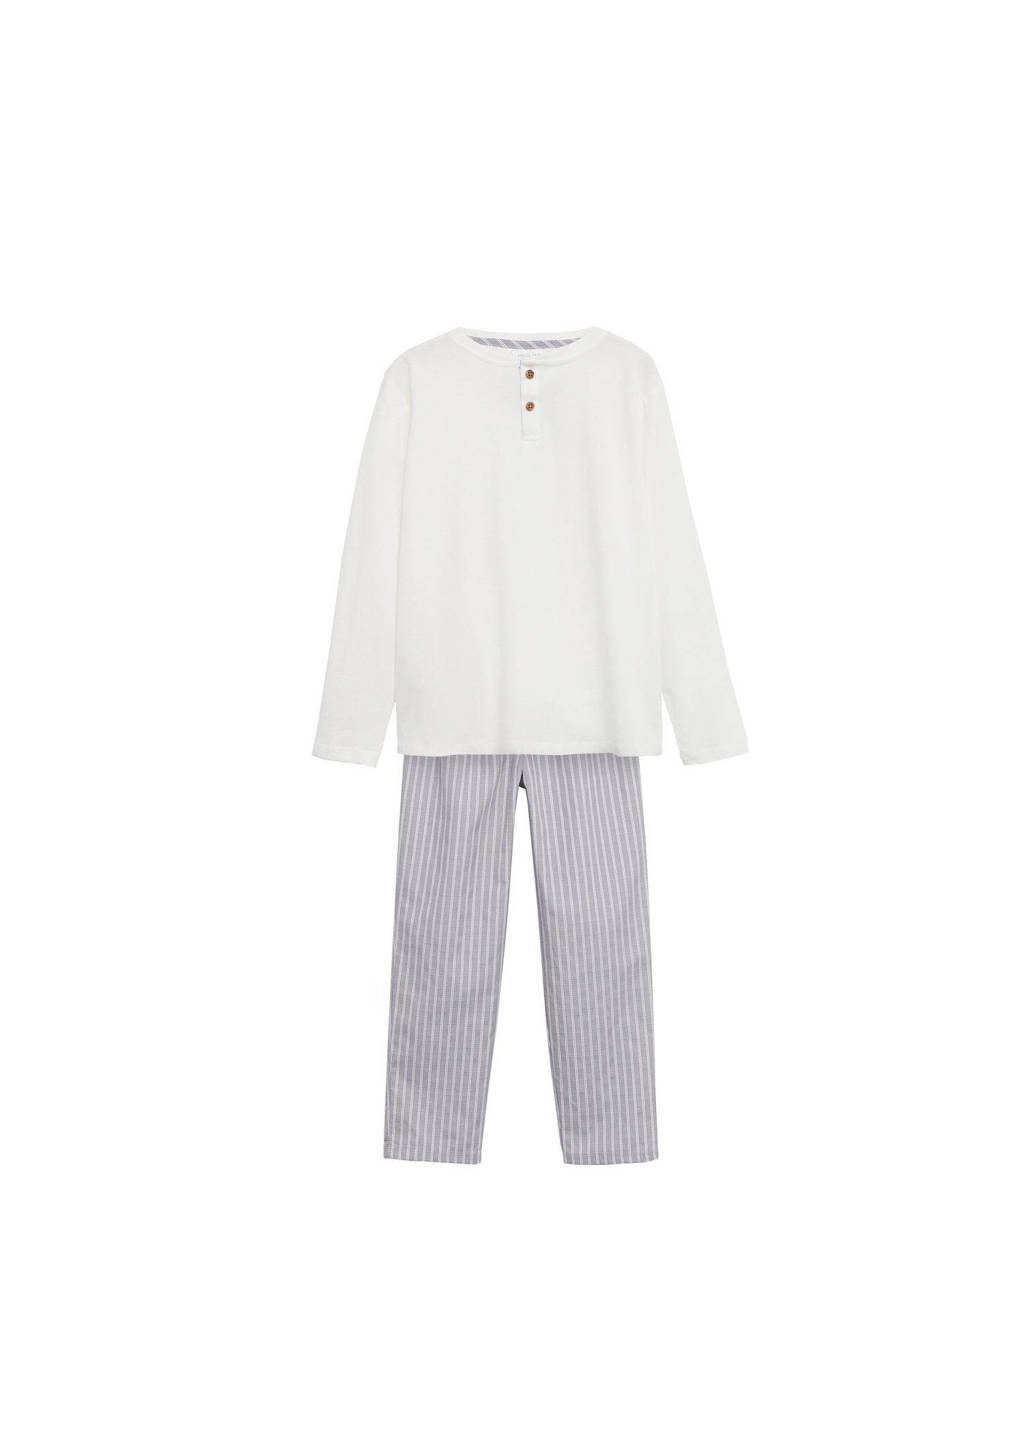 Mango Kids   pyjama naturel wit, Lichtgrijs/naturel wit